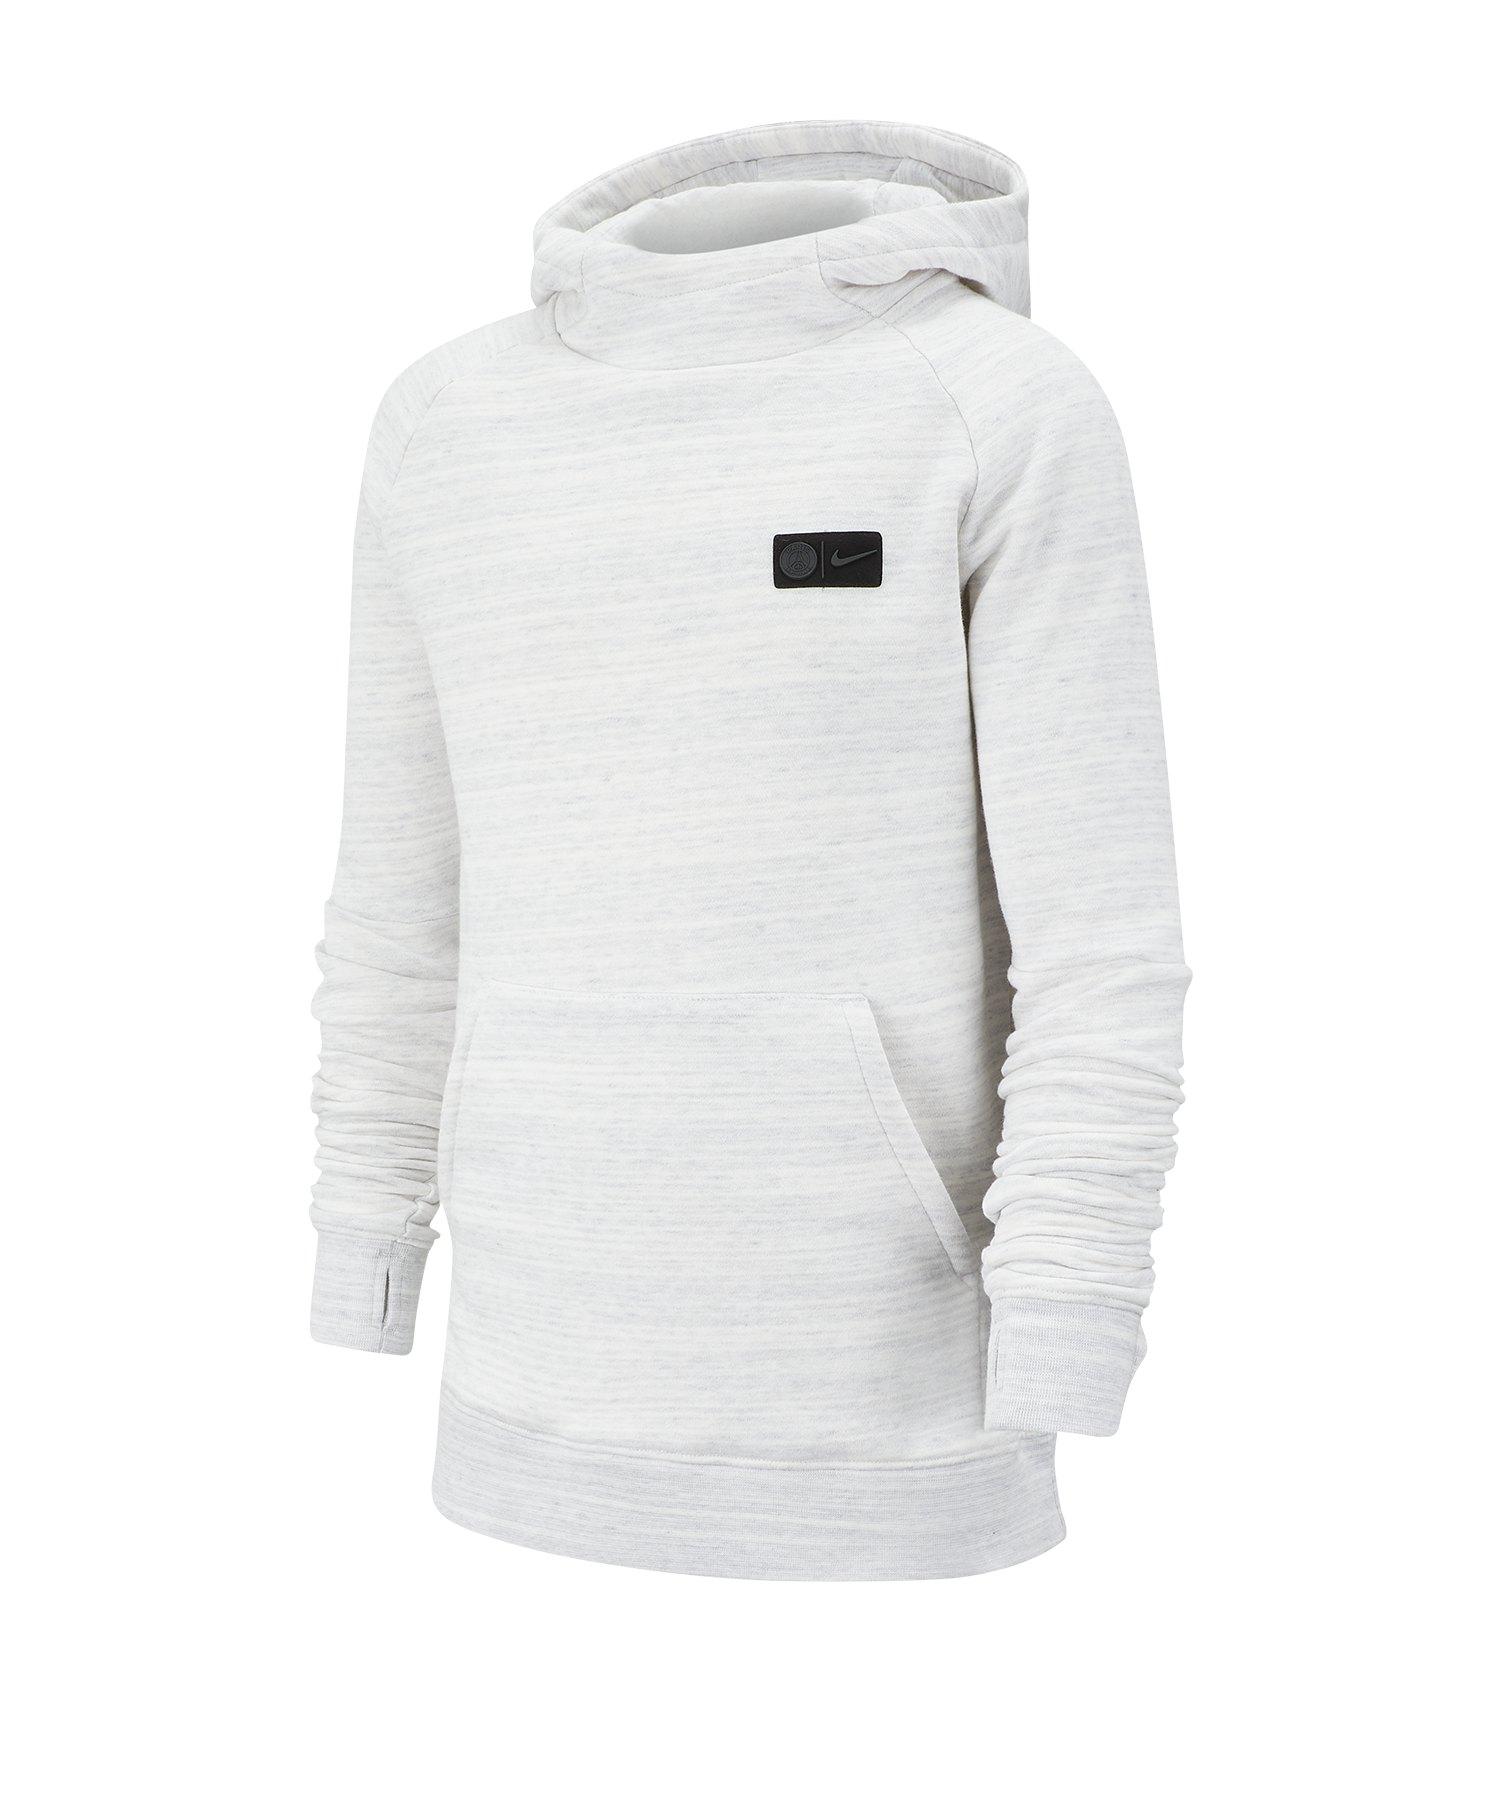 Nike Paris St. Germain Kapuzensweatshirt Kids F104 - weiss